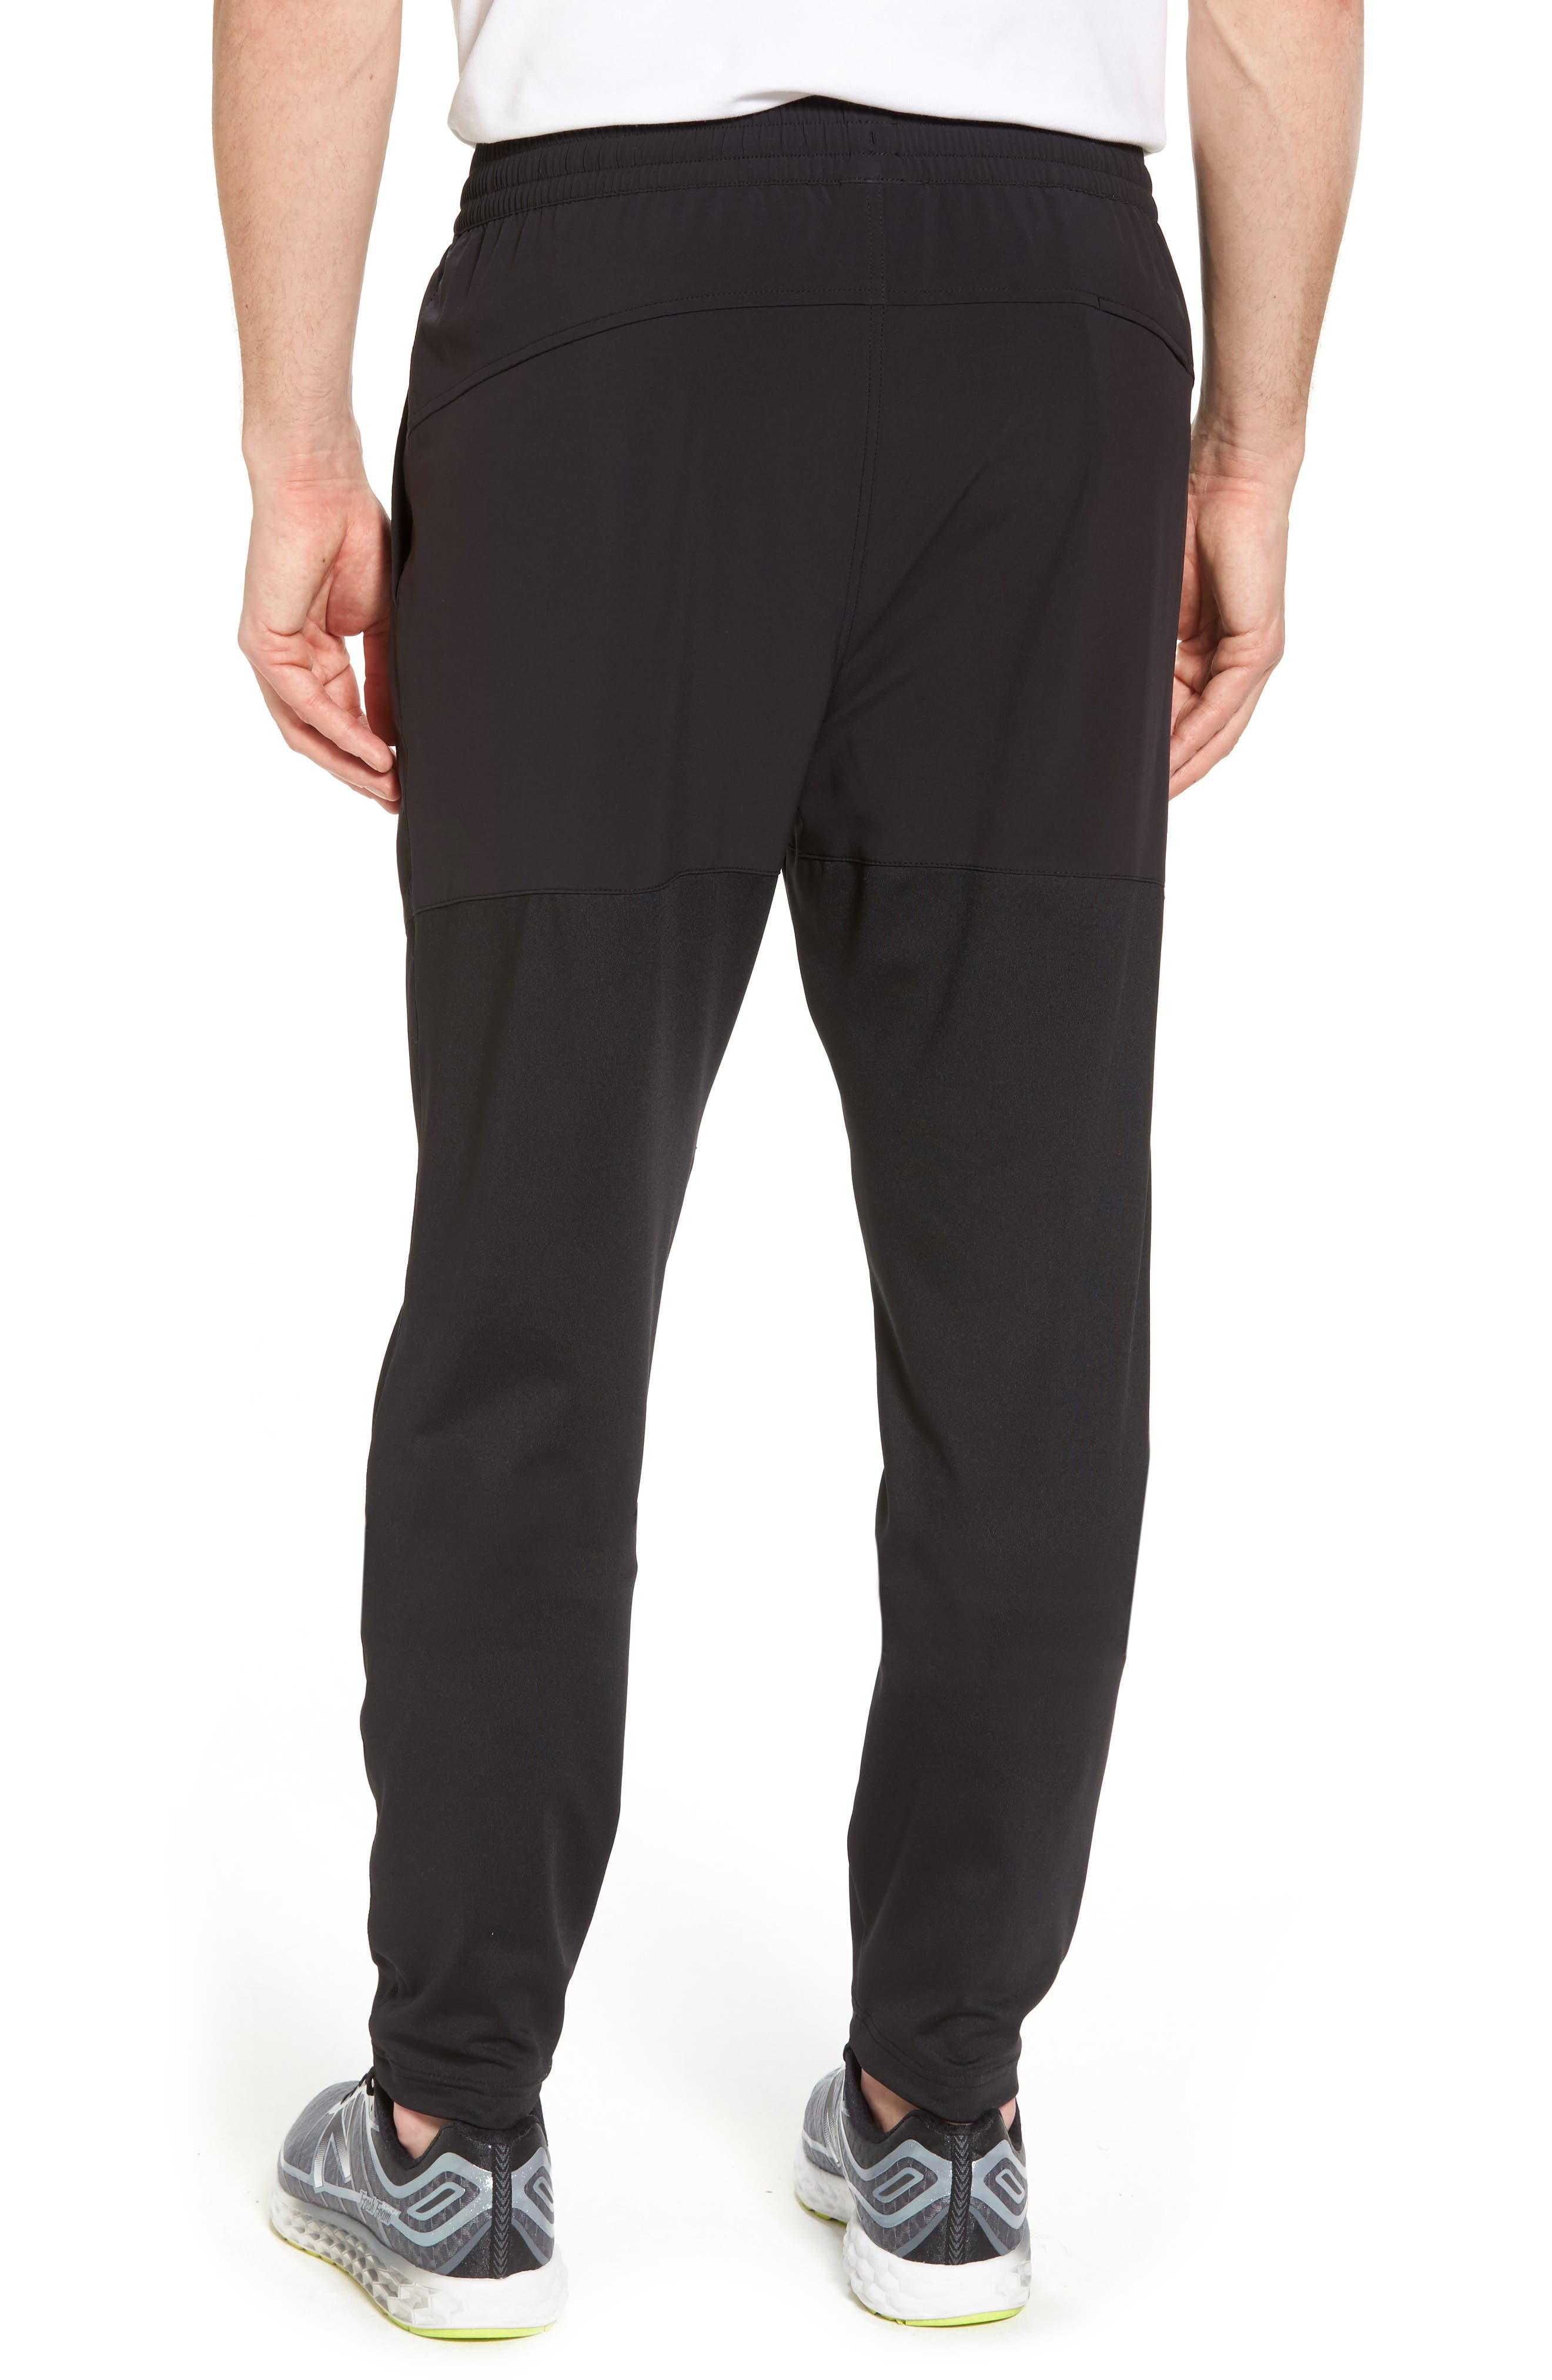 Graphite Tapered Athletic Pants,                             Alternate thumbnail 2, color,                             Black